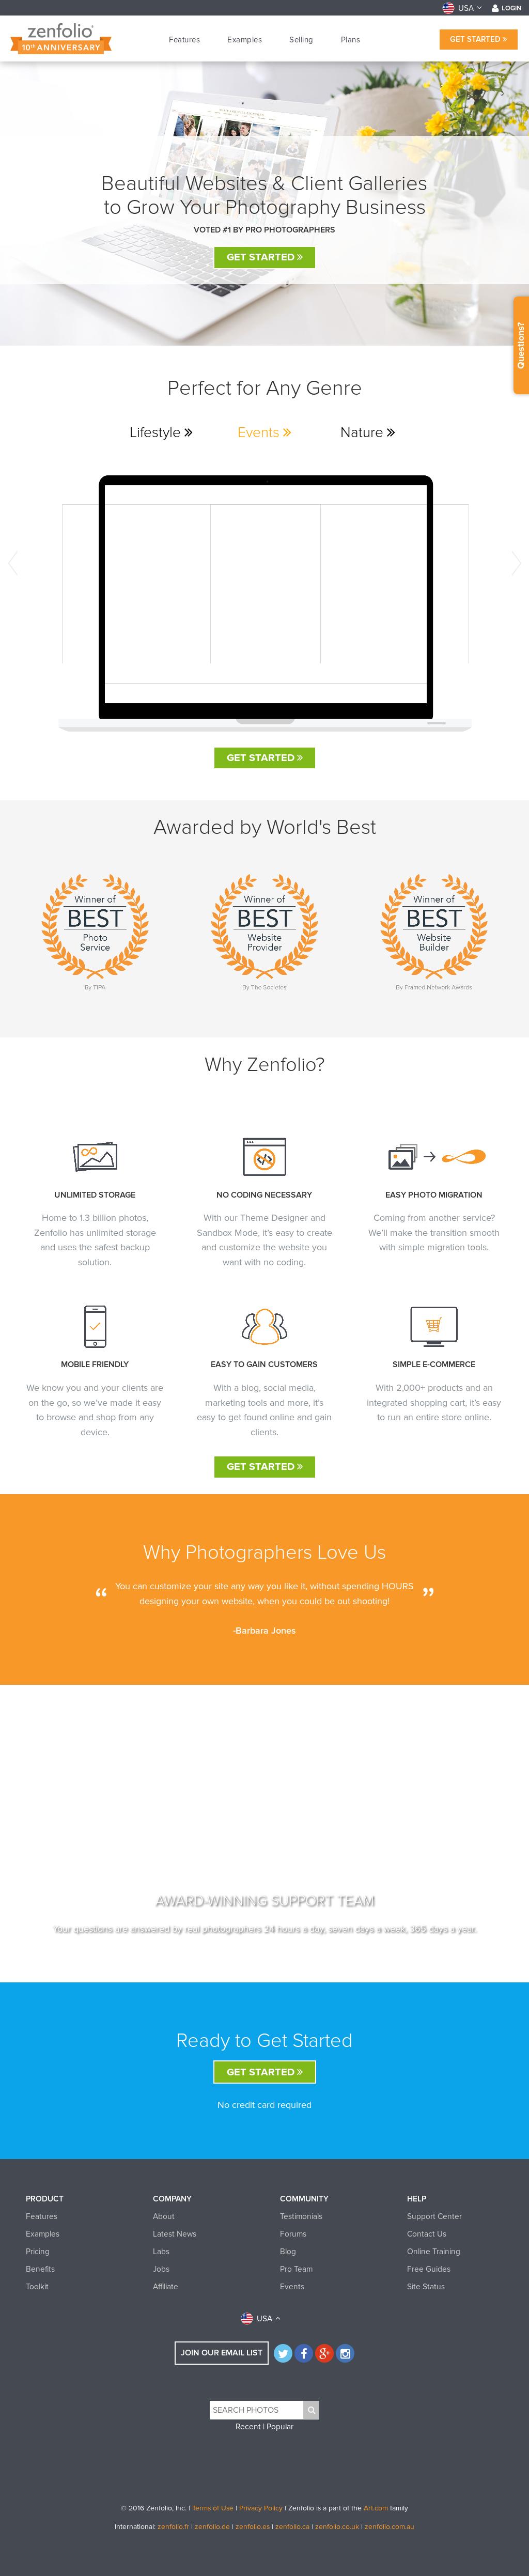 Zenfolio Competitors, Revenue and Employees - Owler Company